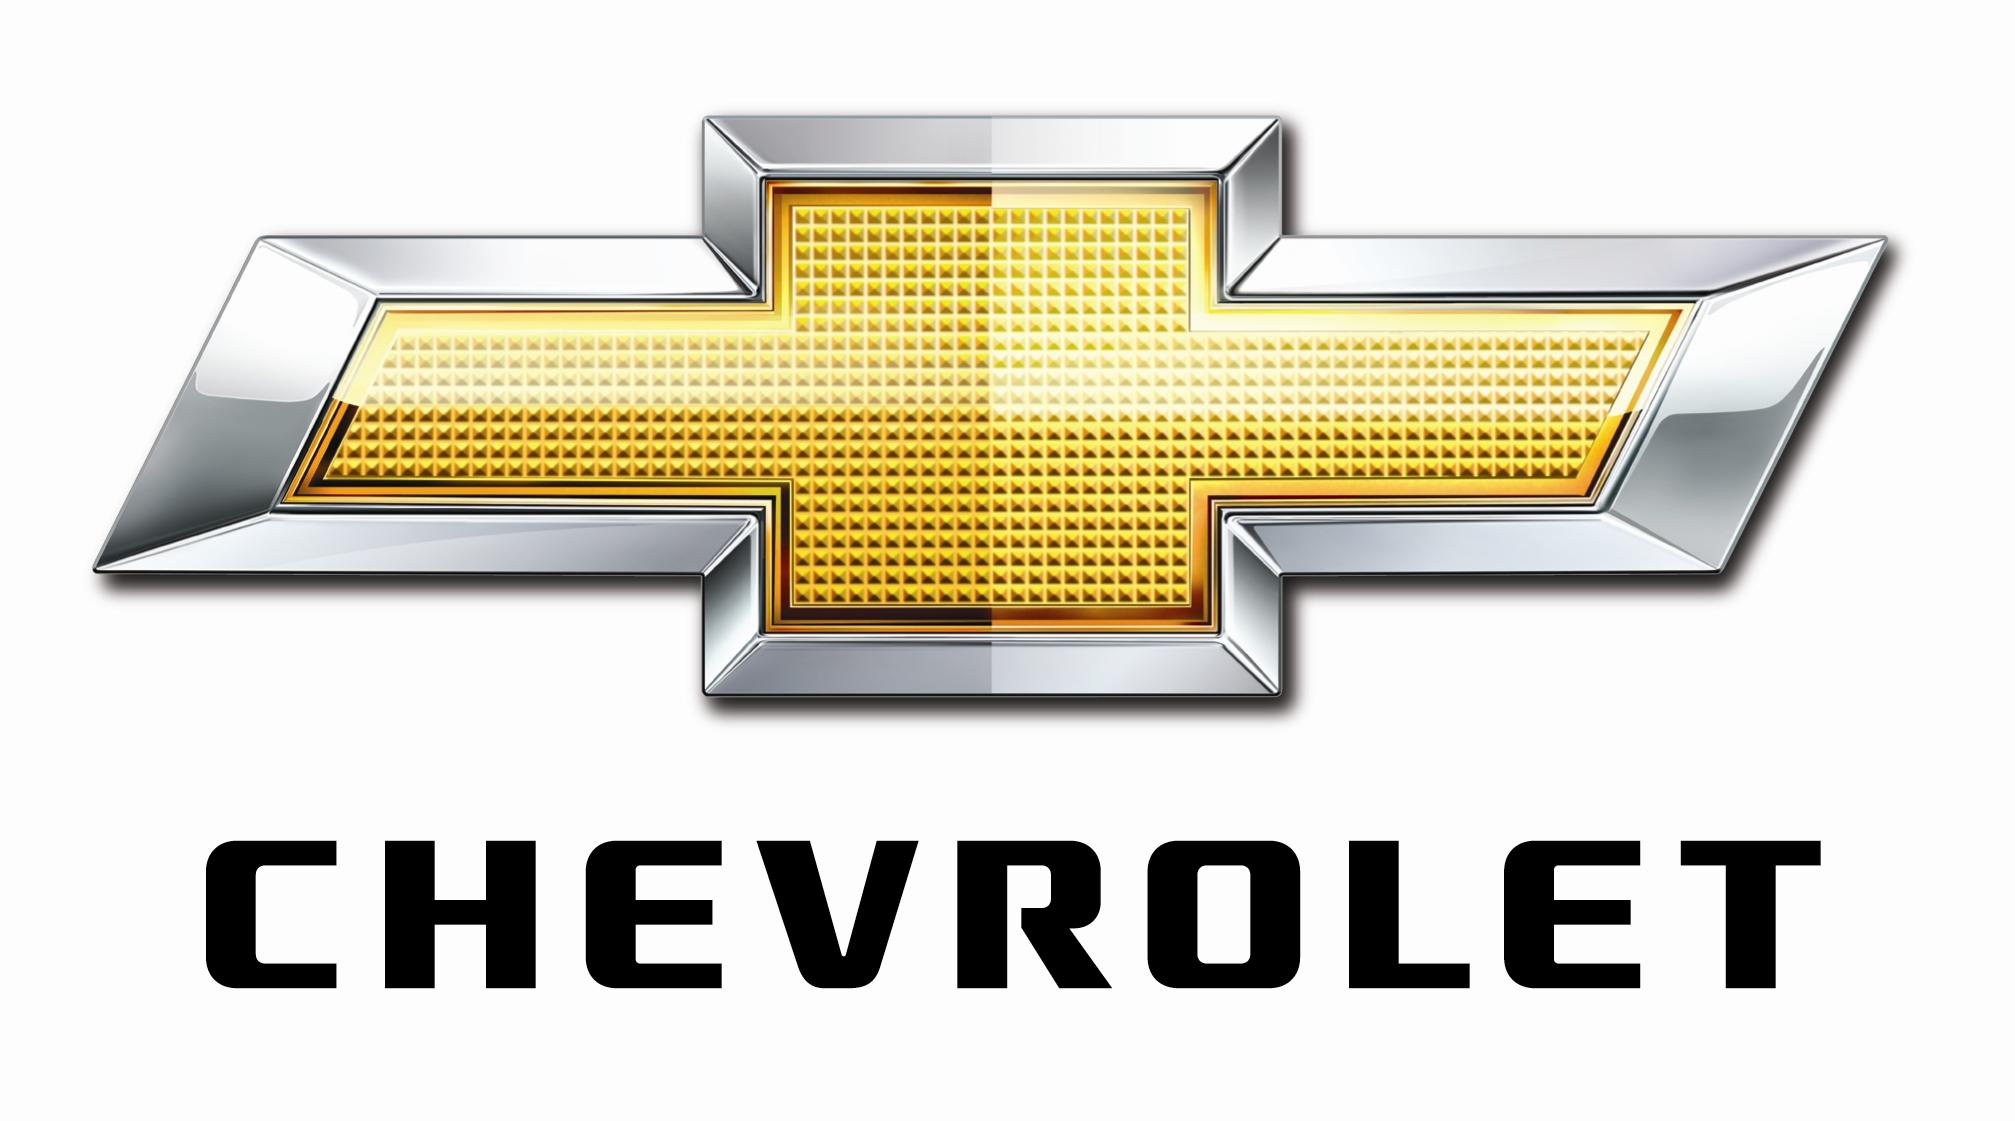 chevrolet logo hd wallpapers Desktop Backgrounds for HD 2015x1121